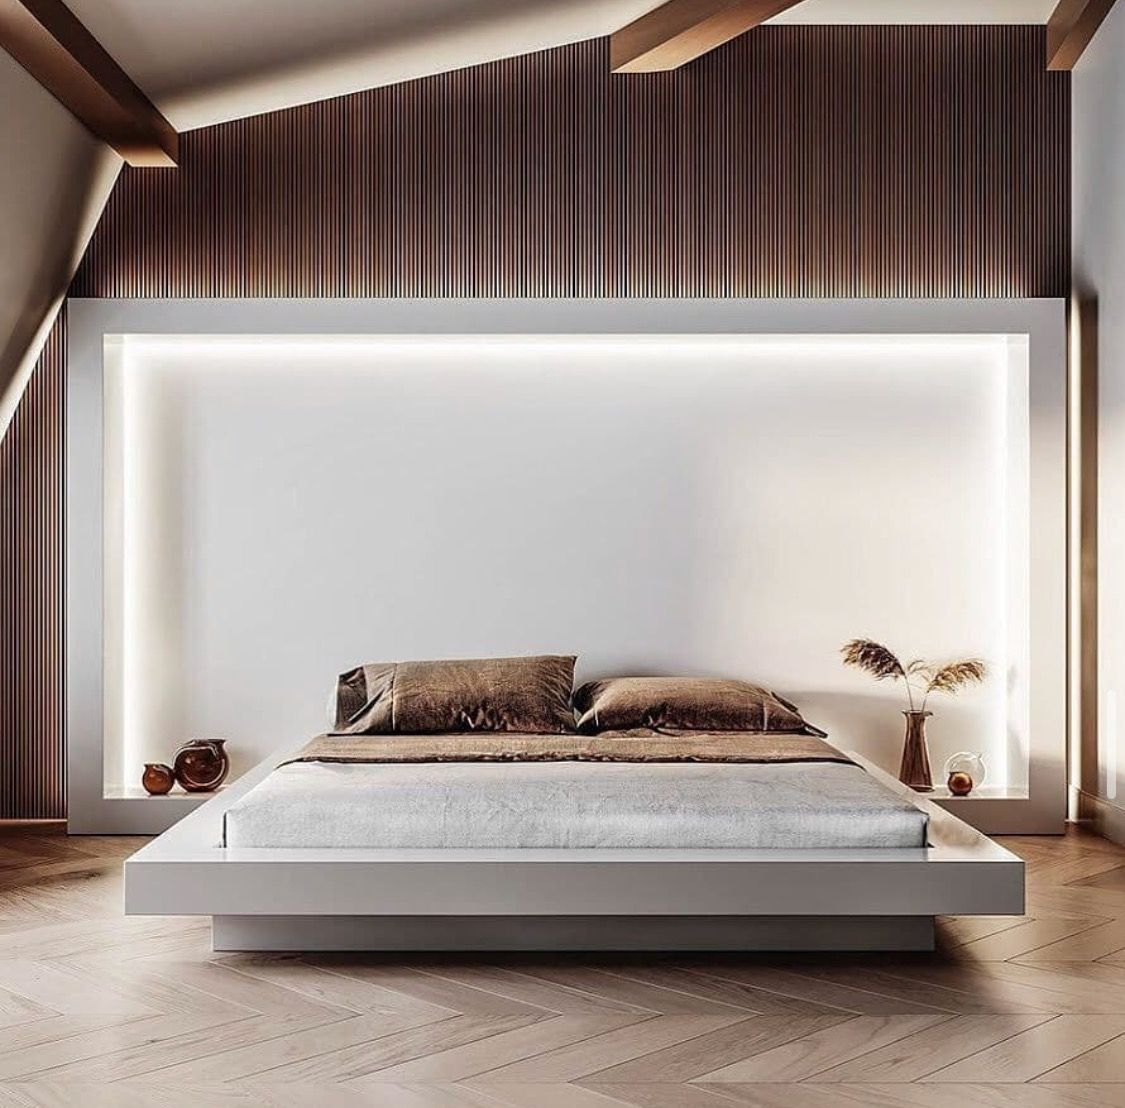 Backlit Headboard Wall Minimal Bedroom Design Bedroom Bed Design Modern Bedroom